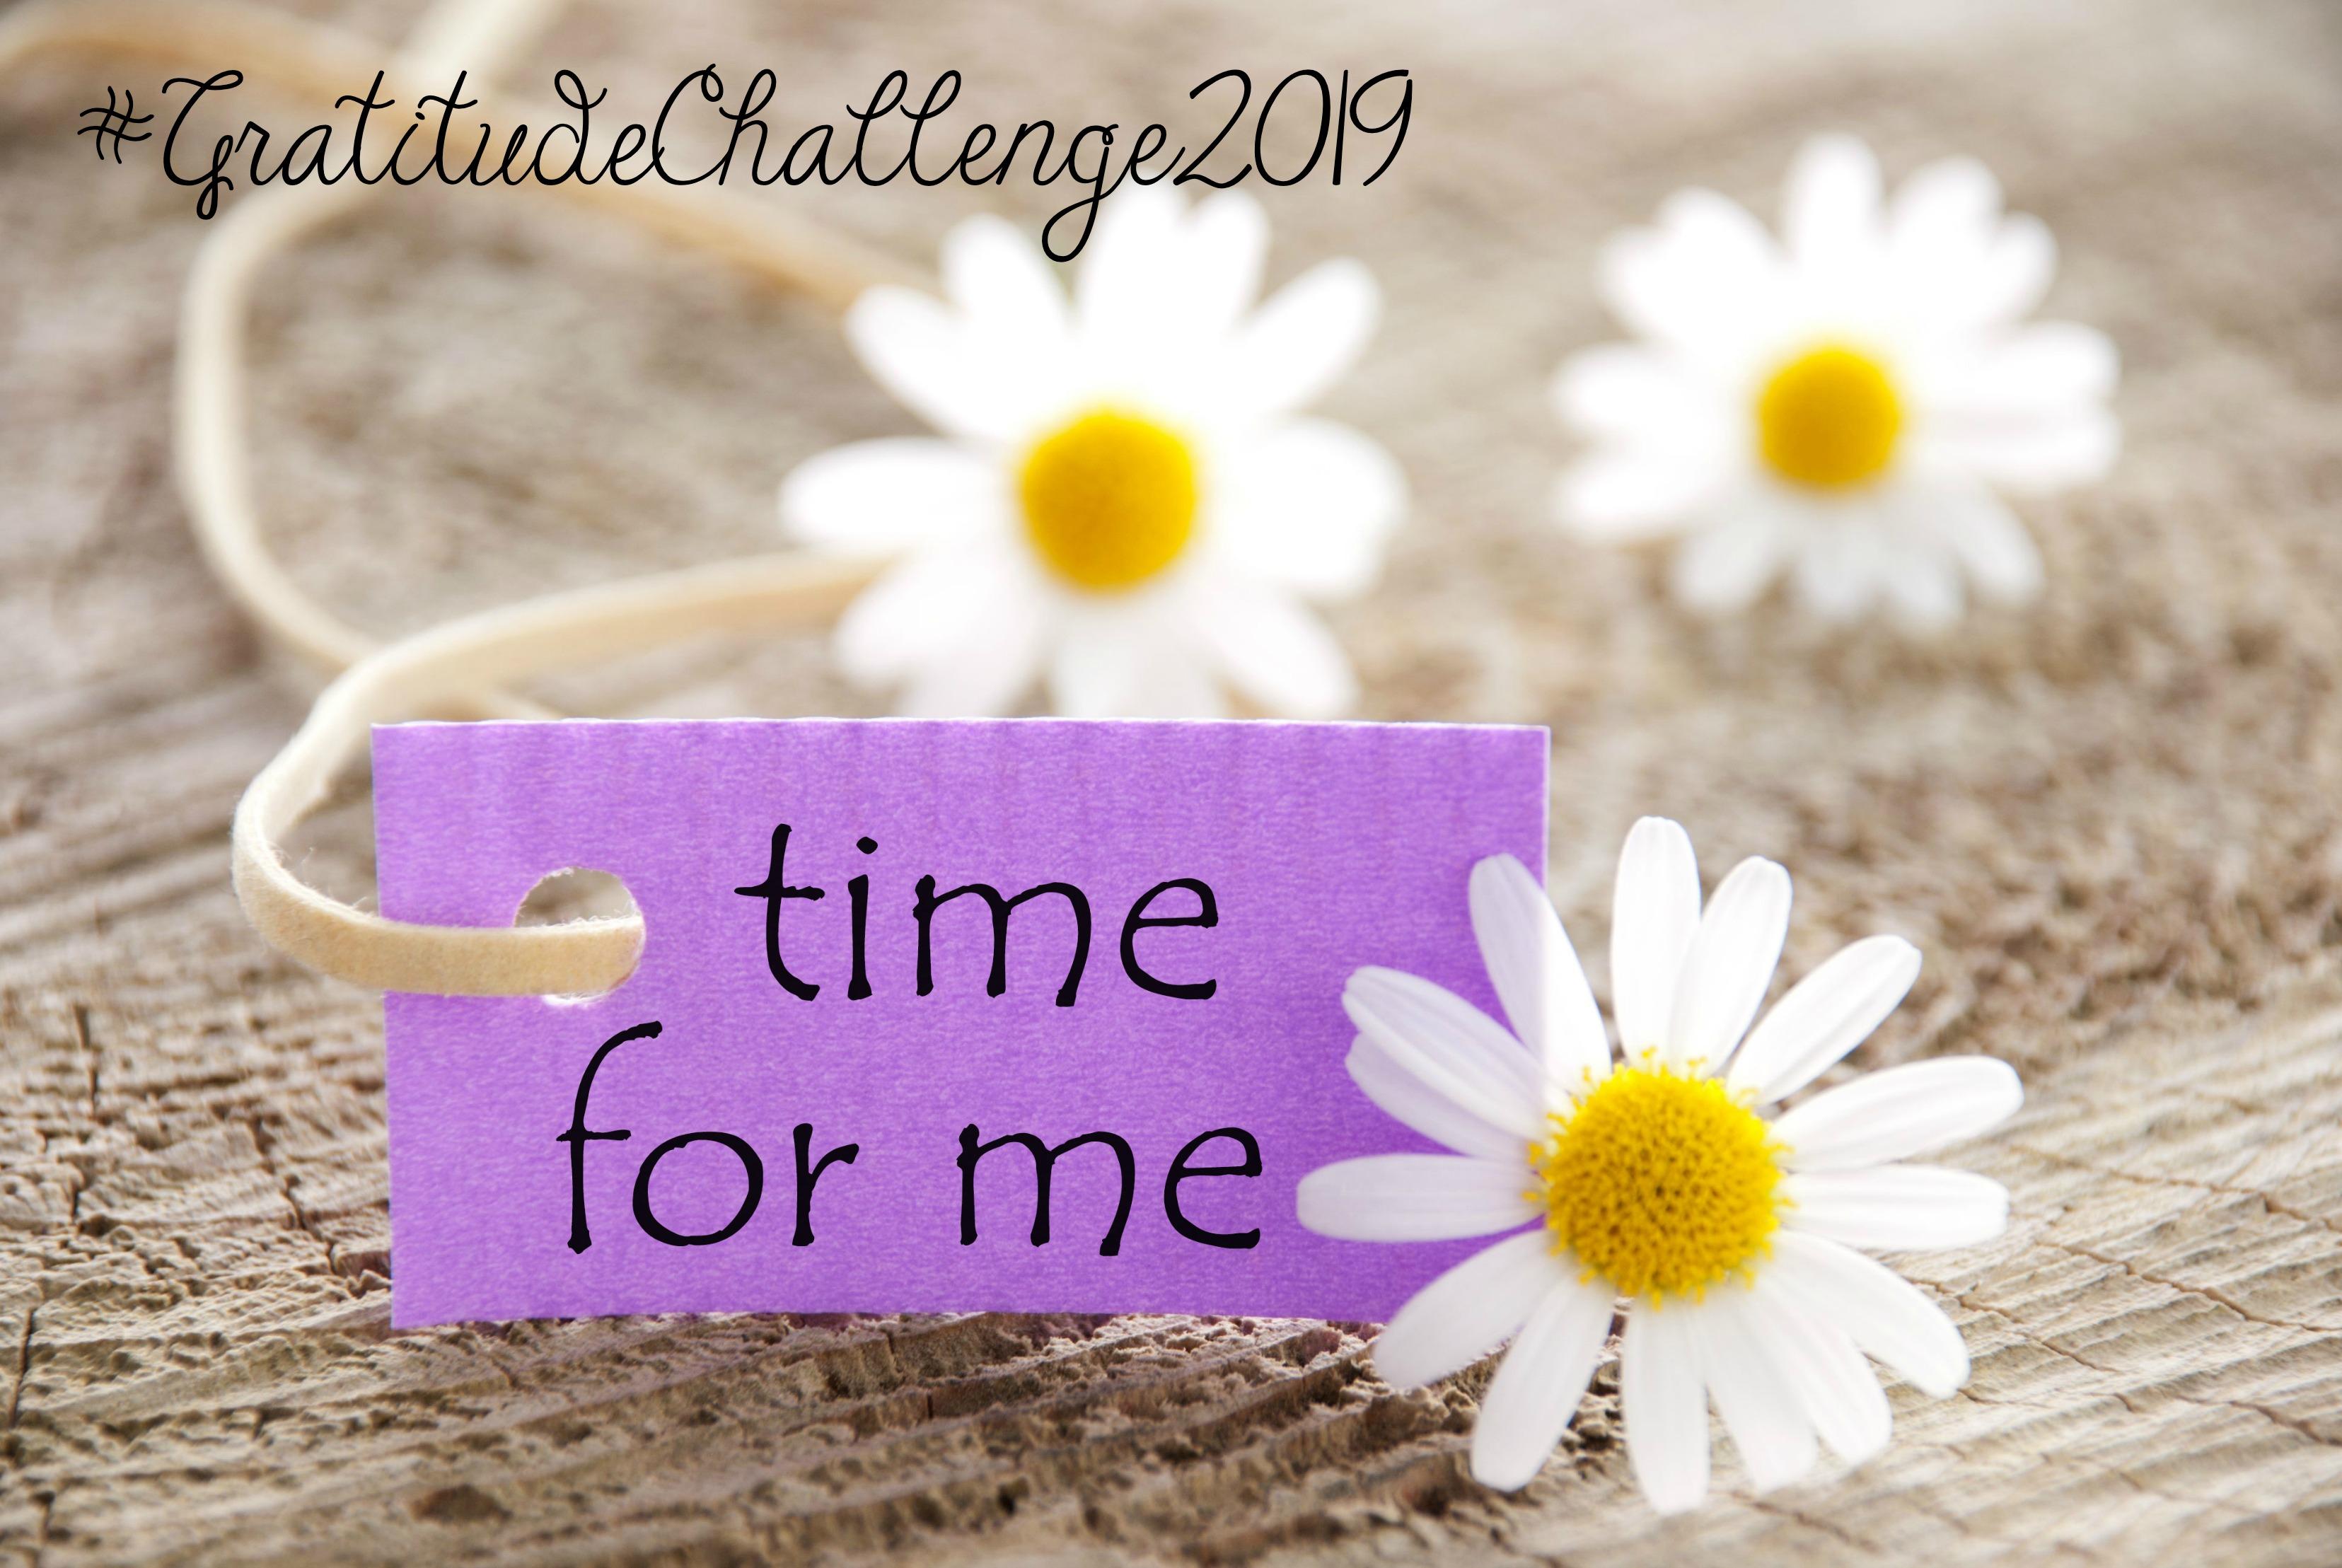 Lovely Gratitude - May 2019 Gratitude Challenge